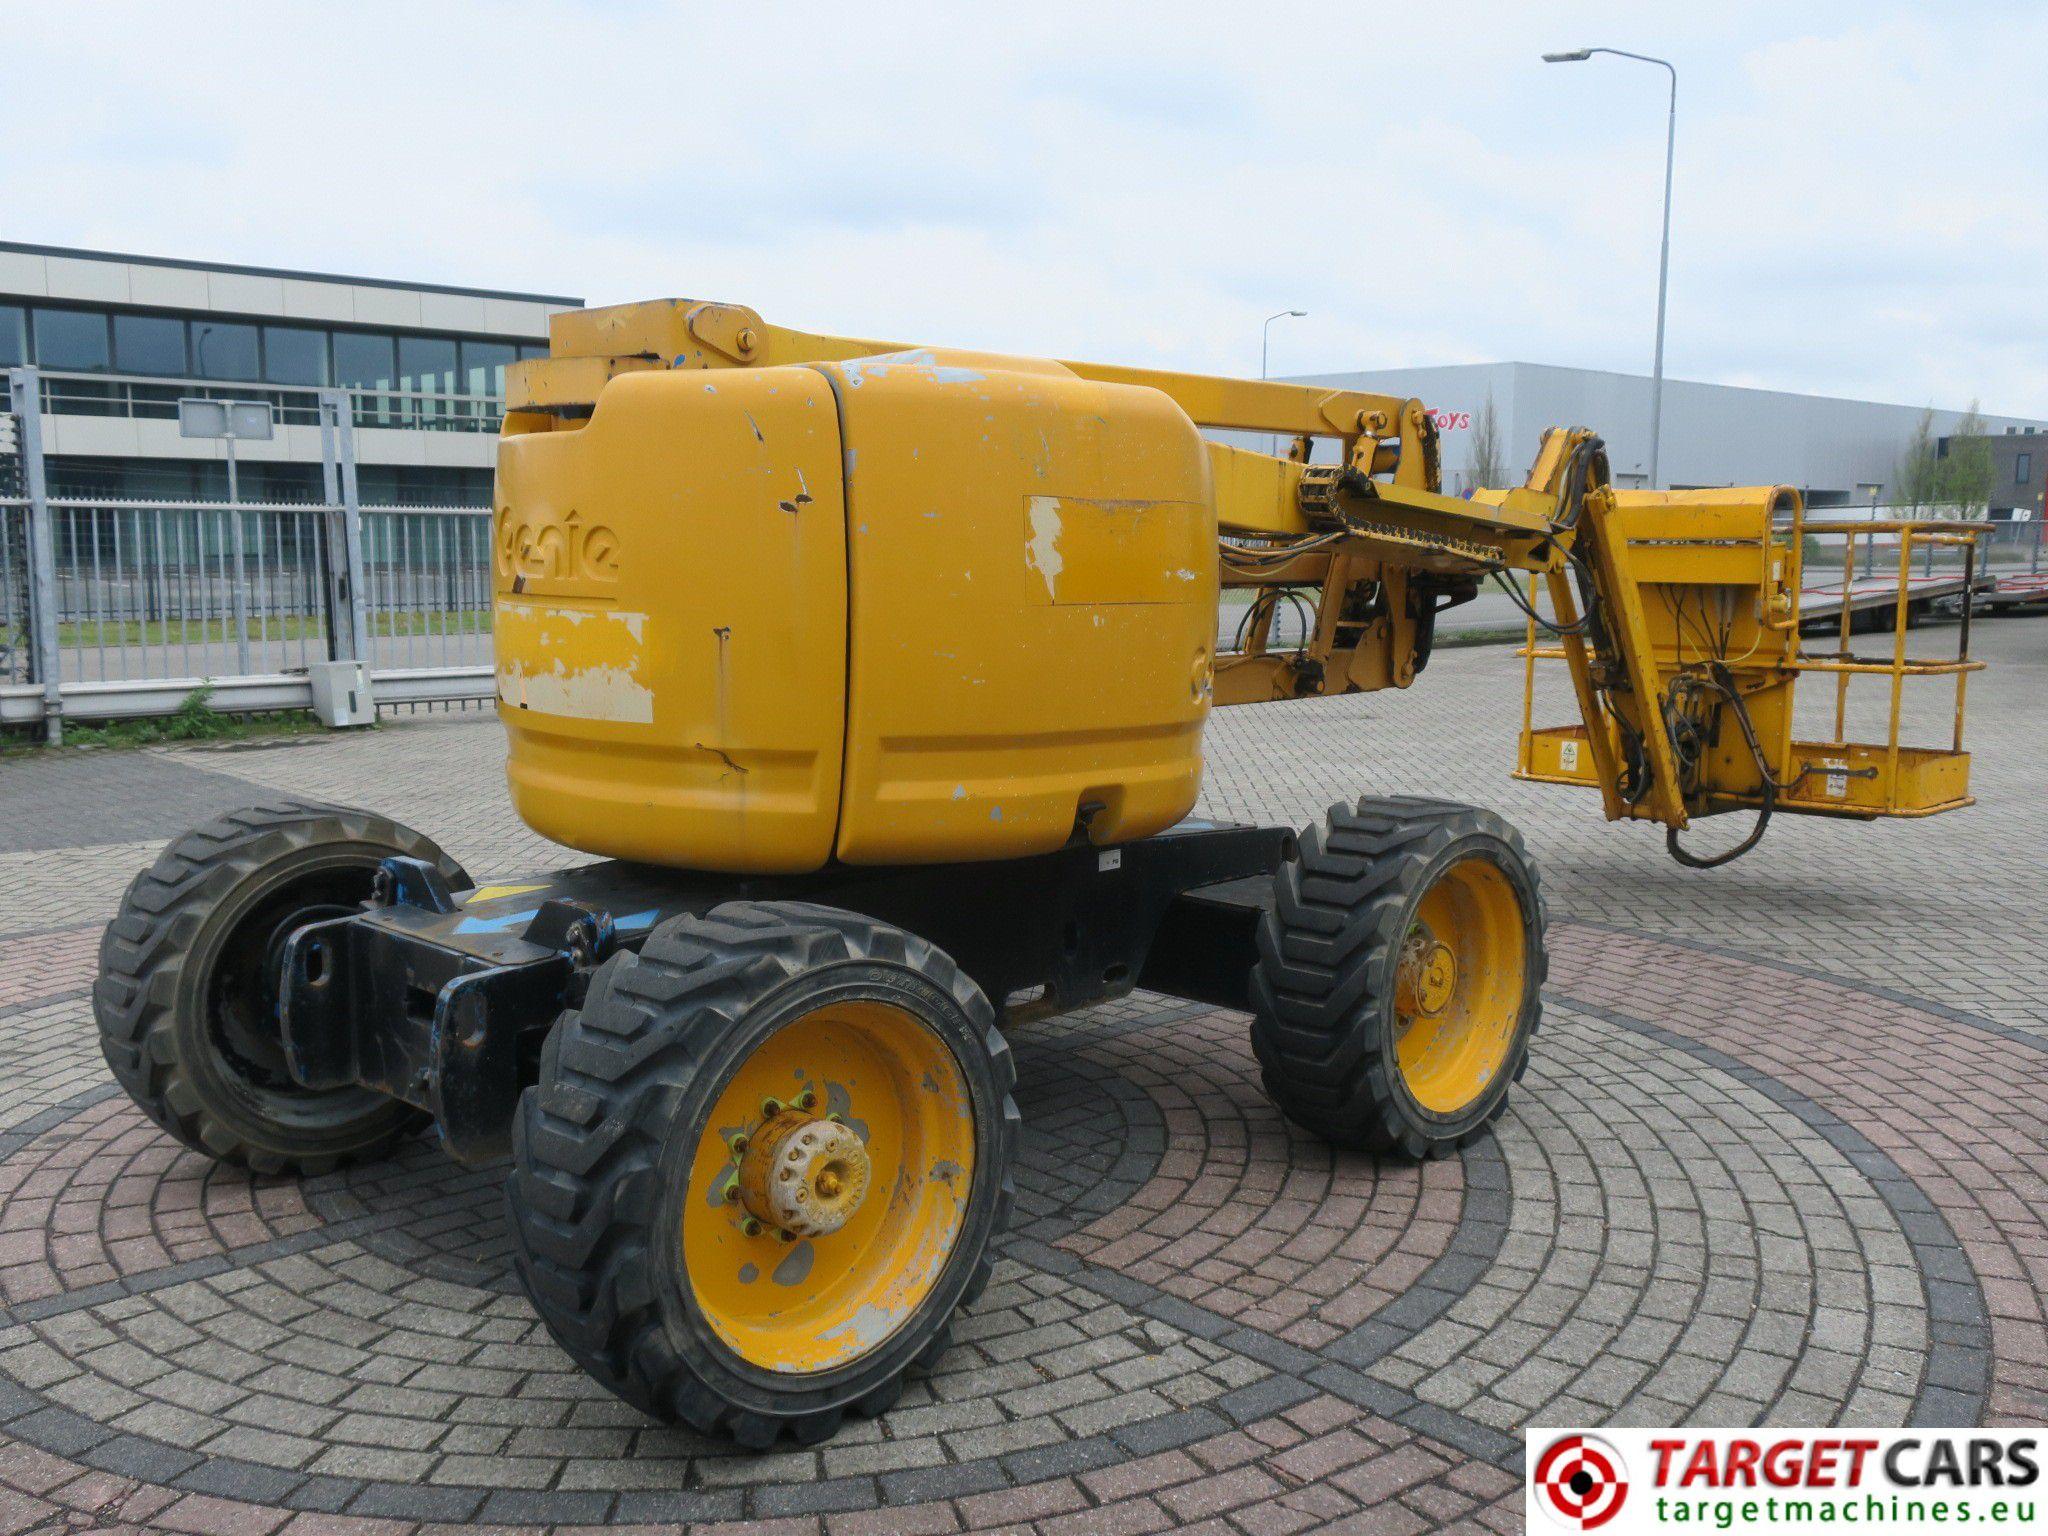 Genie Z 45 25jrt Boom 4x4 Z45 Diesel Articulated Work Lift Wiring Diagram W Jib 1580cm 12 04 3488hrs